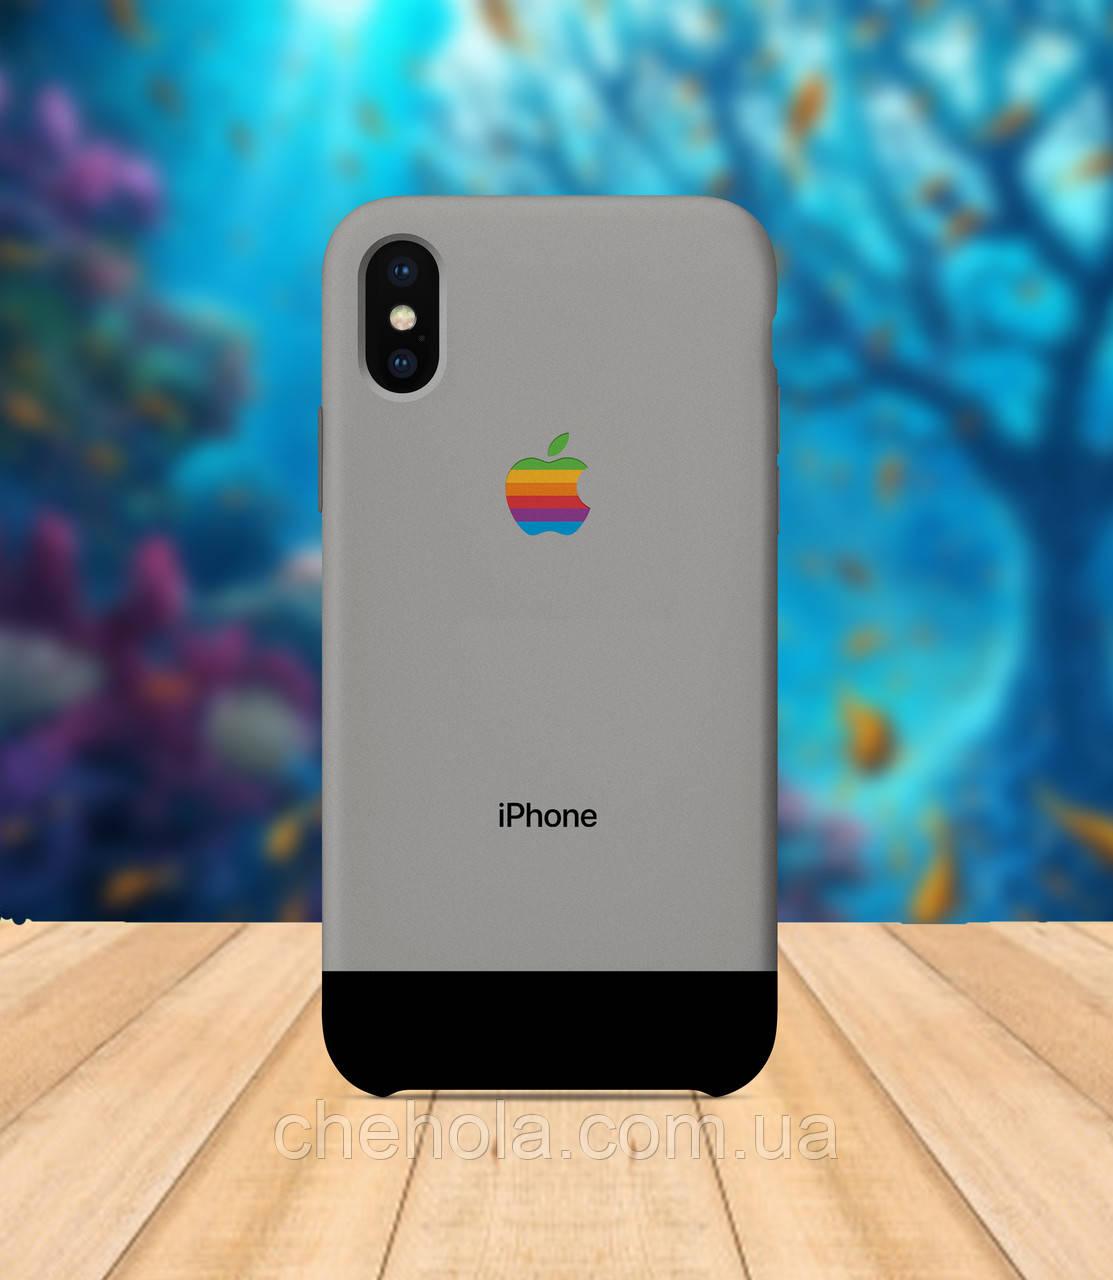 Чехол для apple iphone x XS max Iphone  серый чехол с принтом